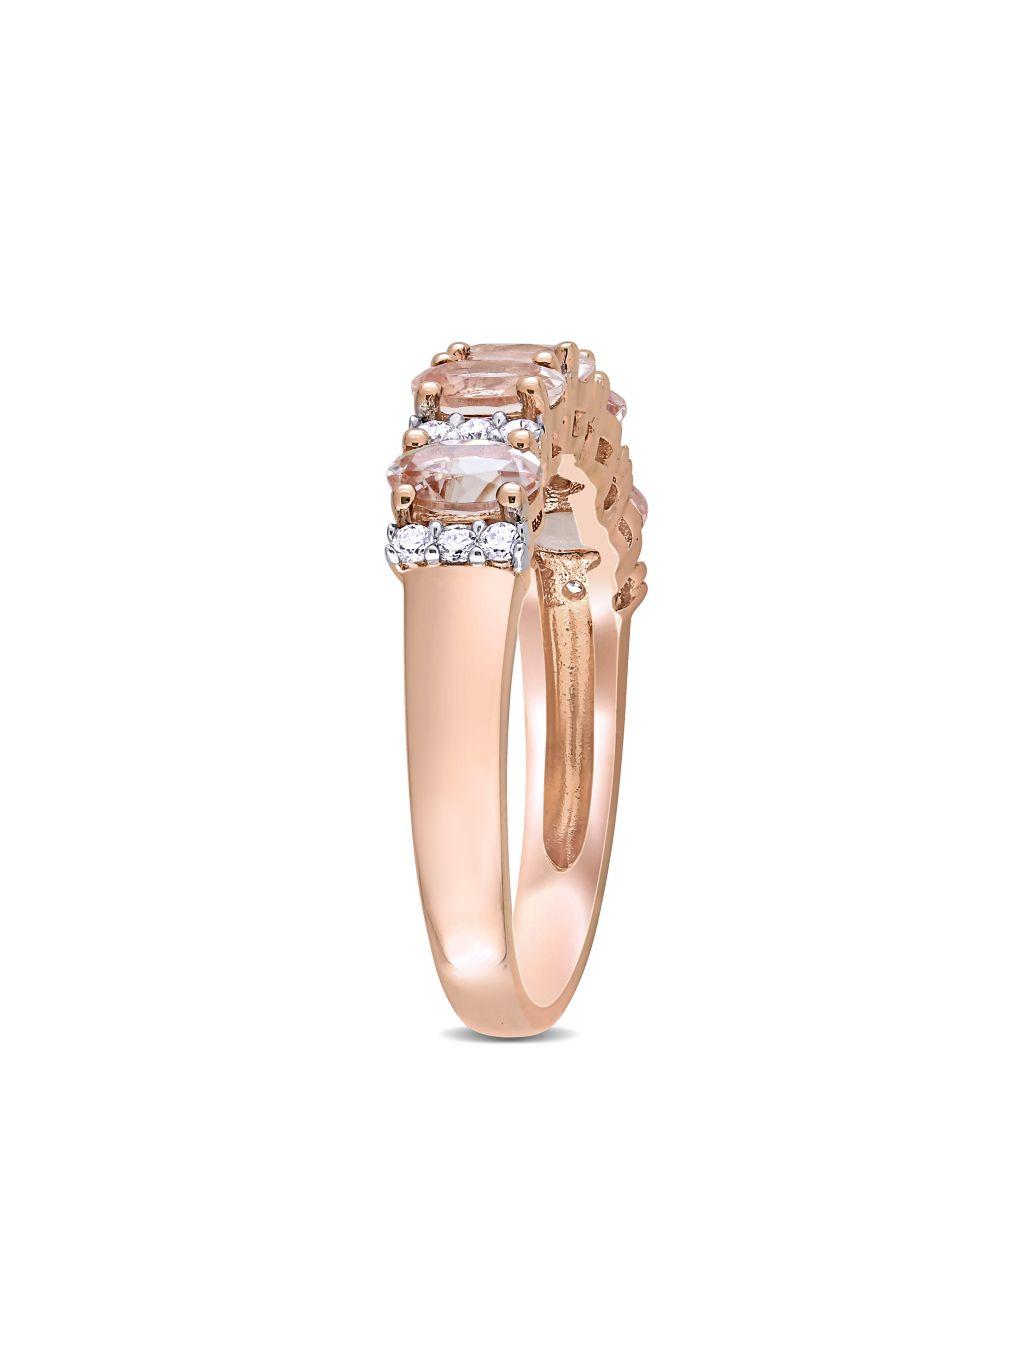 Saks Fifth Avenue 14K Rose Gold, Morganite & Diamond Ring